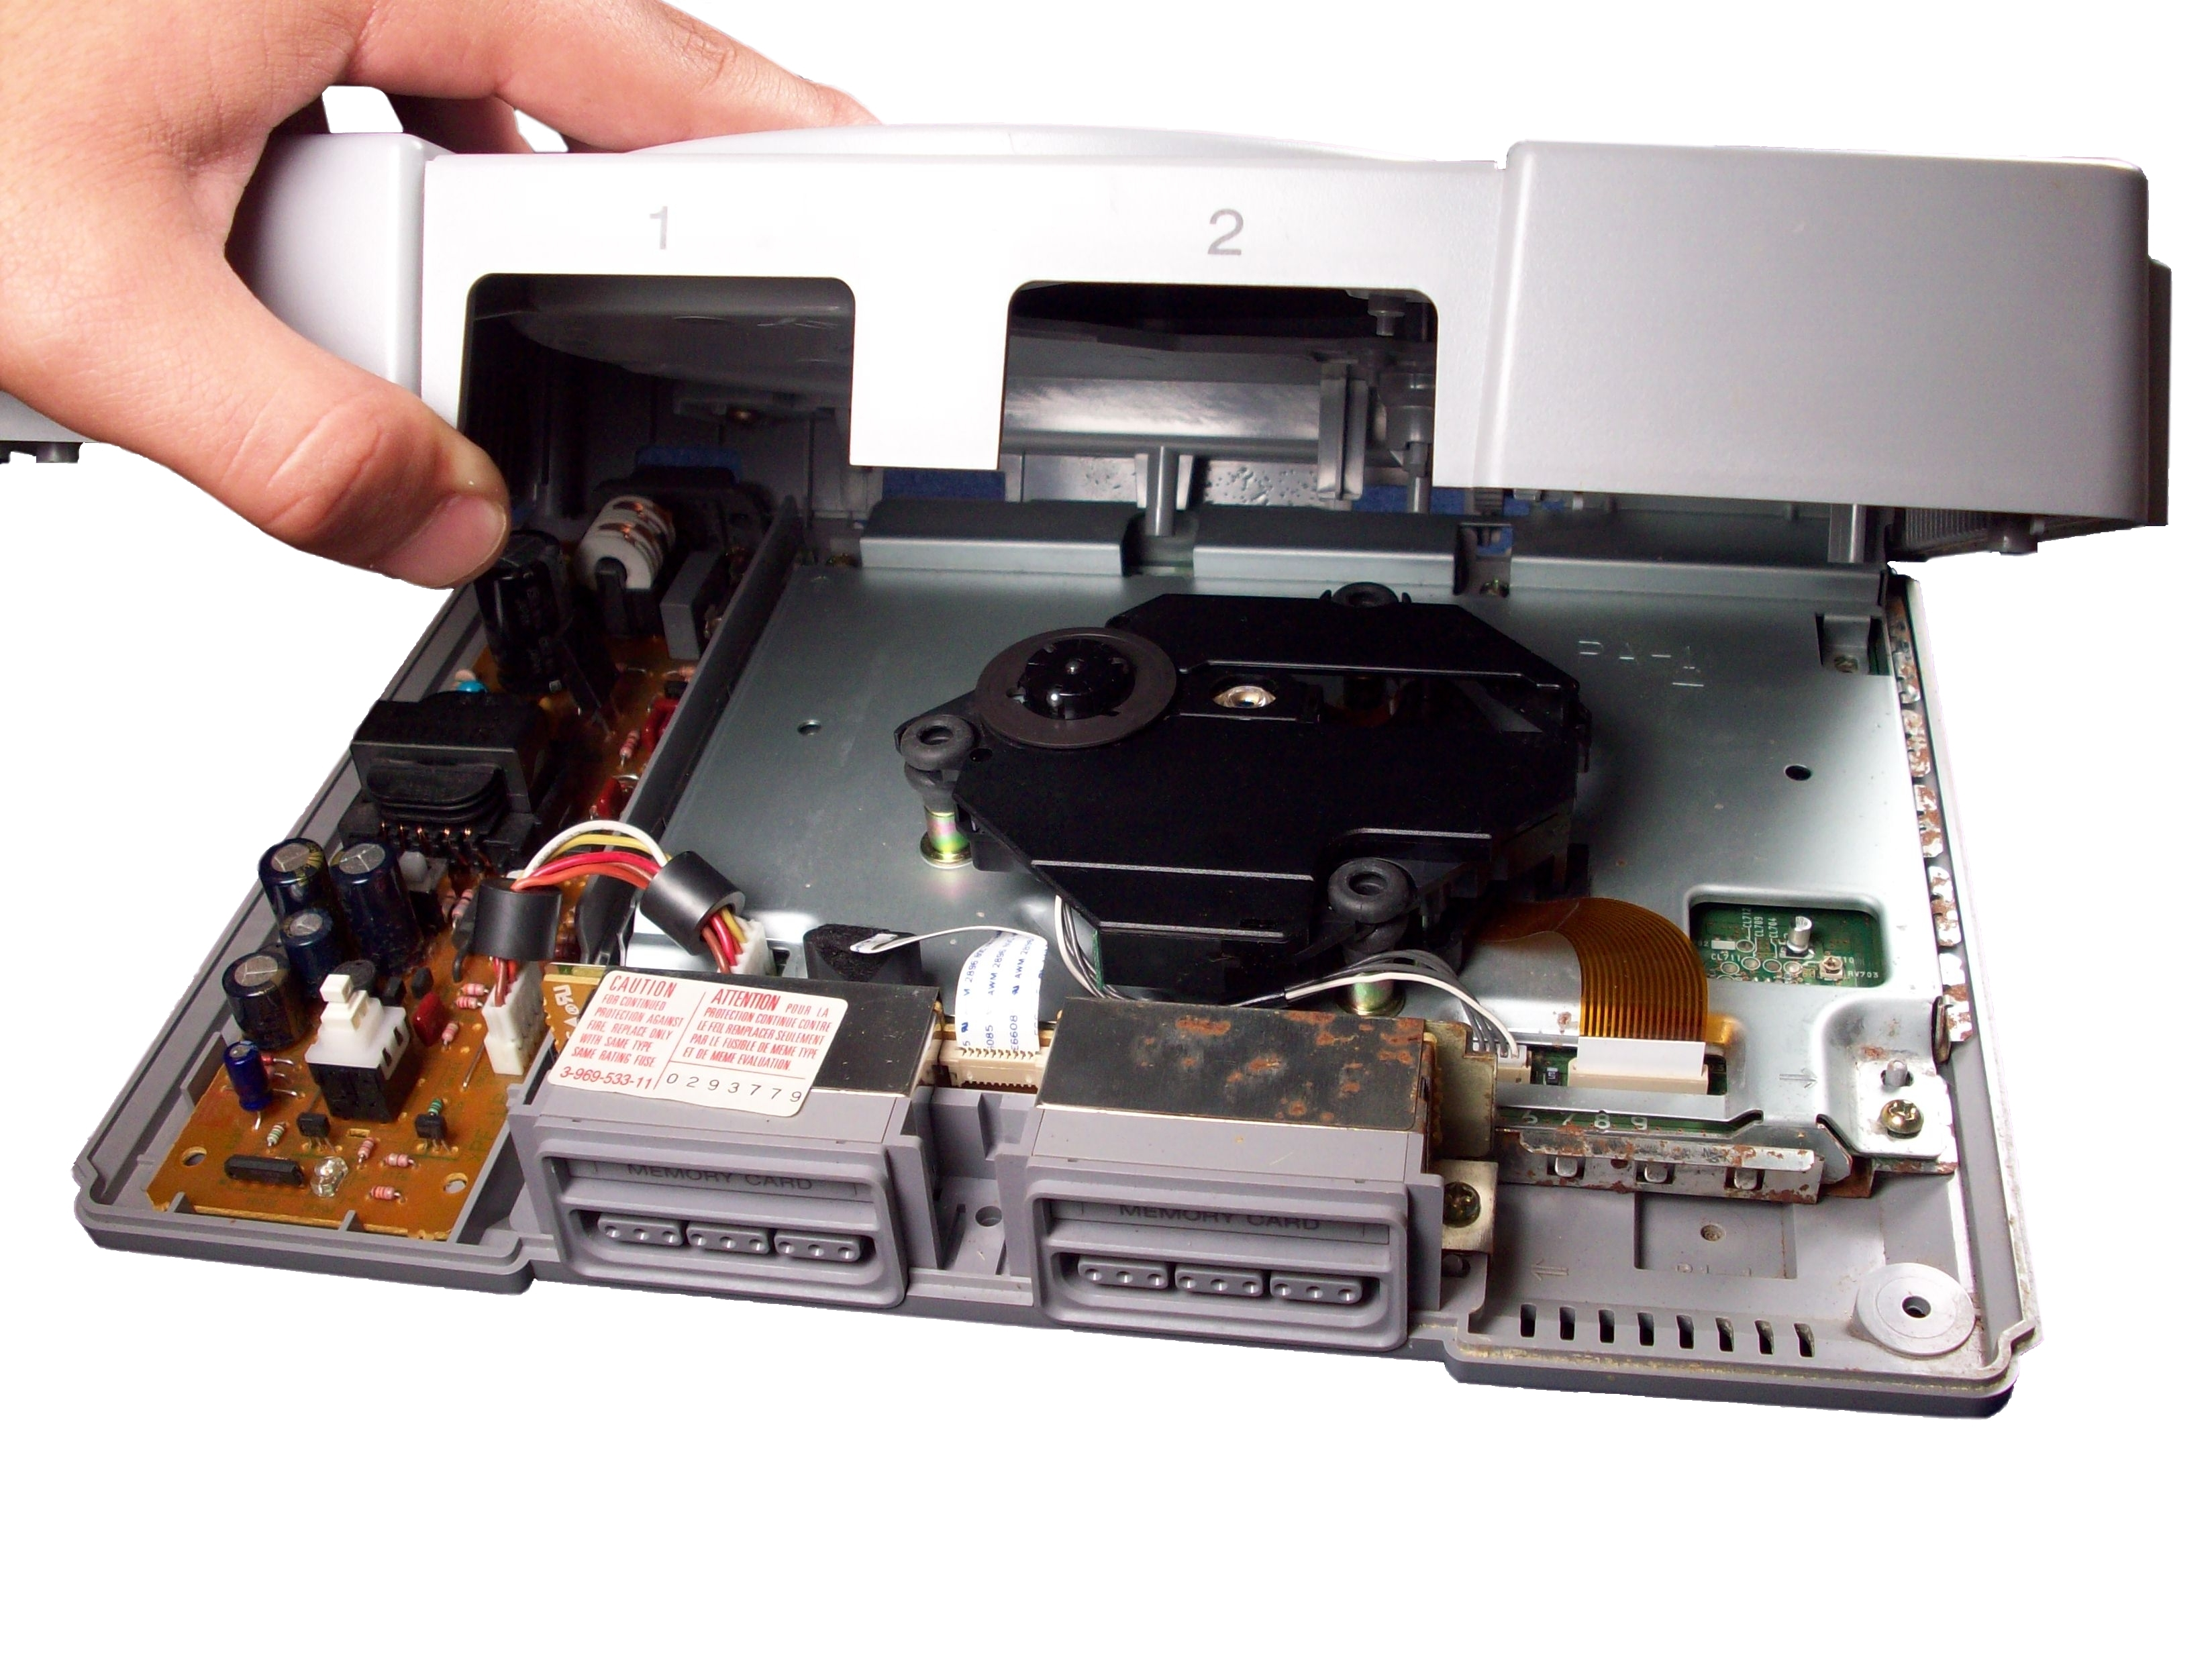 PlayStation Repair - iFixit